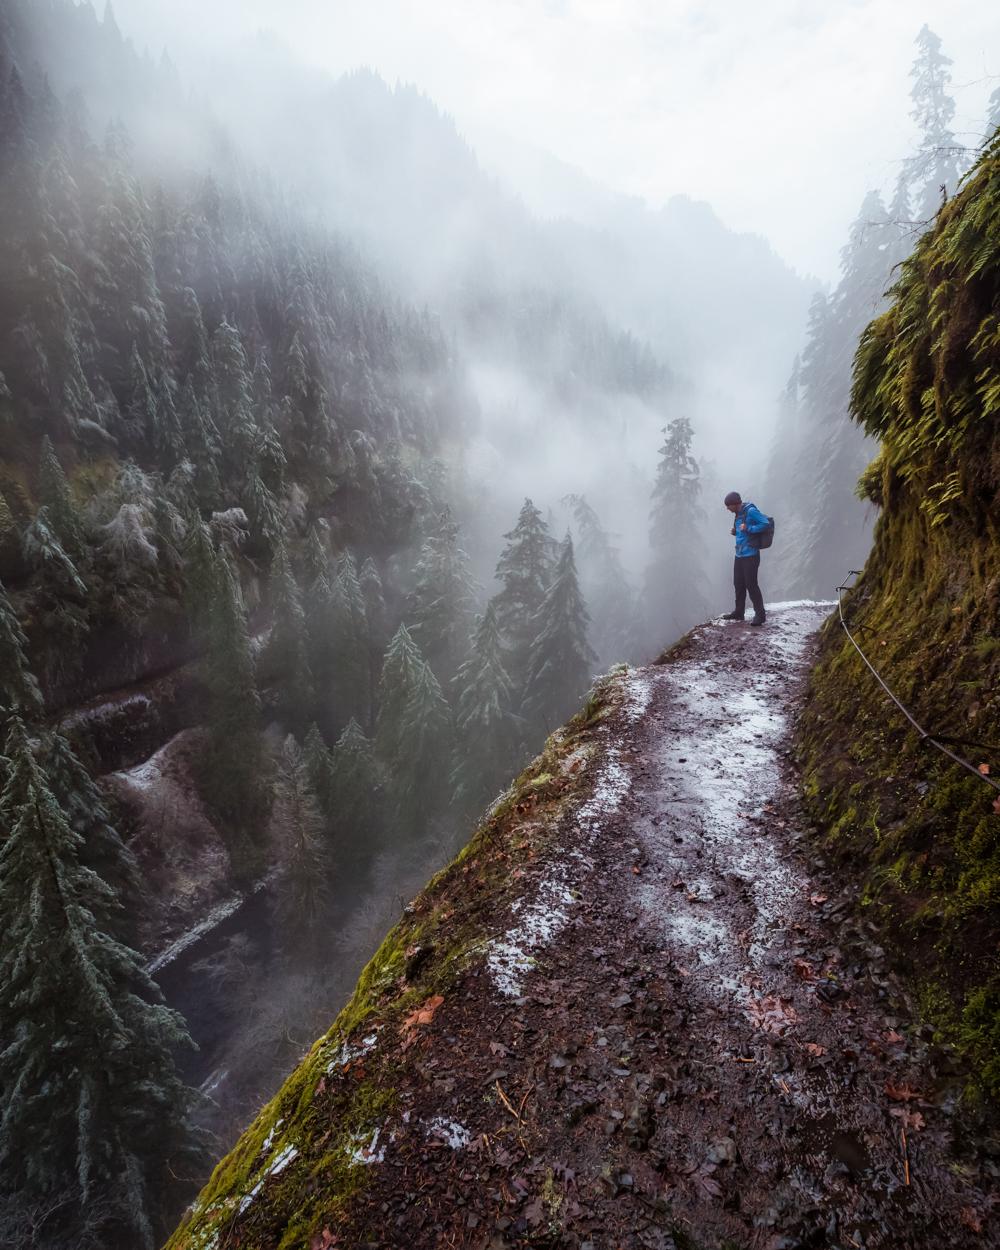 Scott_Kranz_Columbia River Gorge.jpg